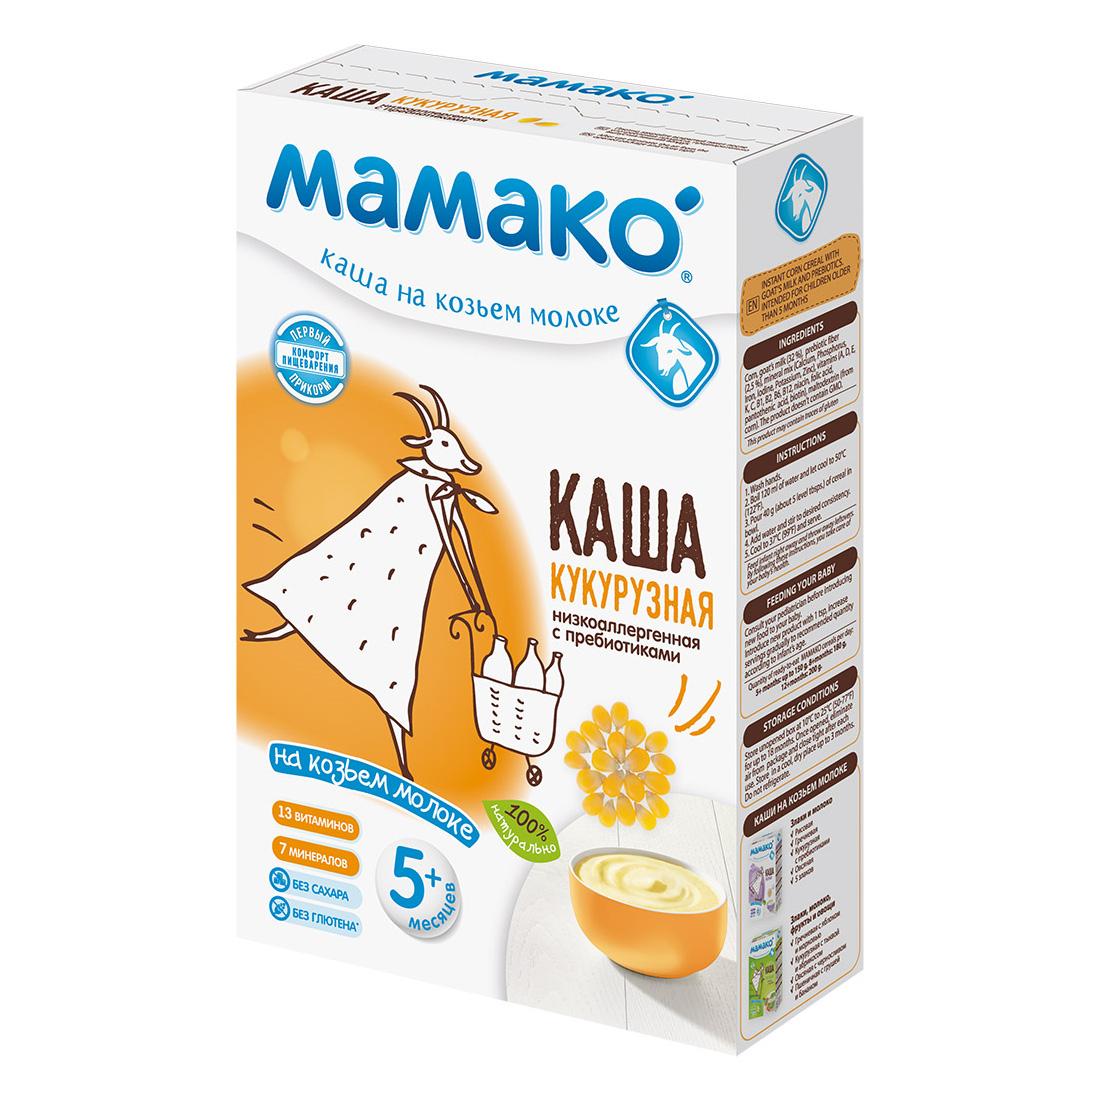 Каша Mamako на козьем молоке 200 гр Кукурузная с пребиотиками (с 5 мес)<br>